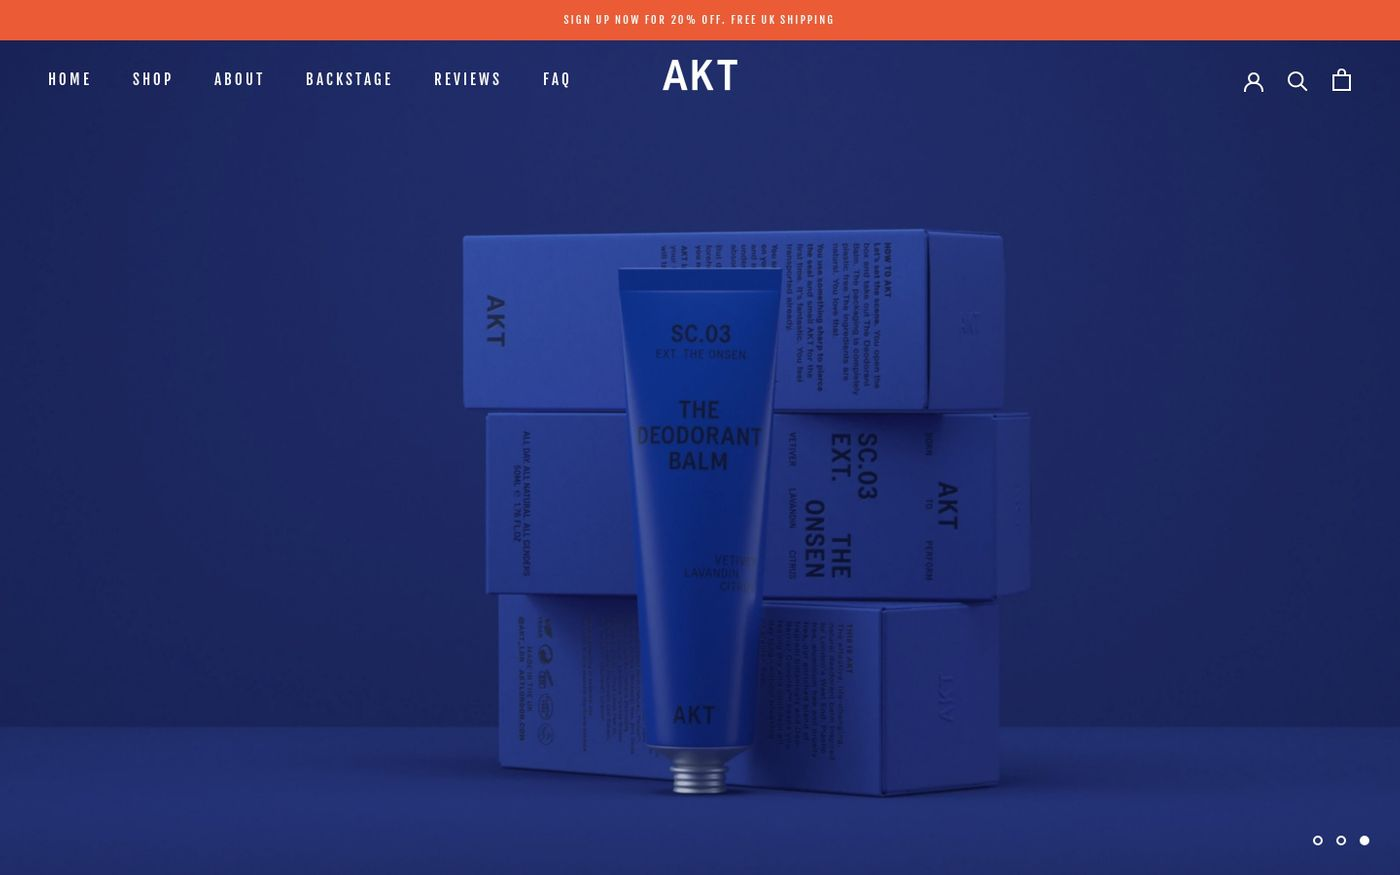 Screenshot of Akt Deodorant website